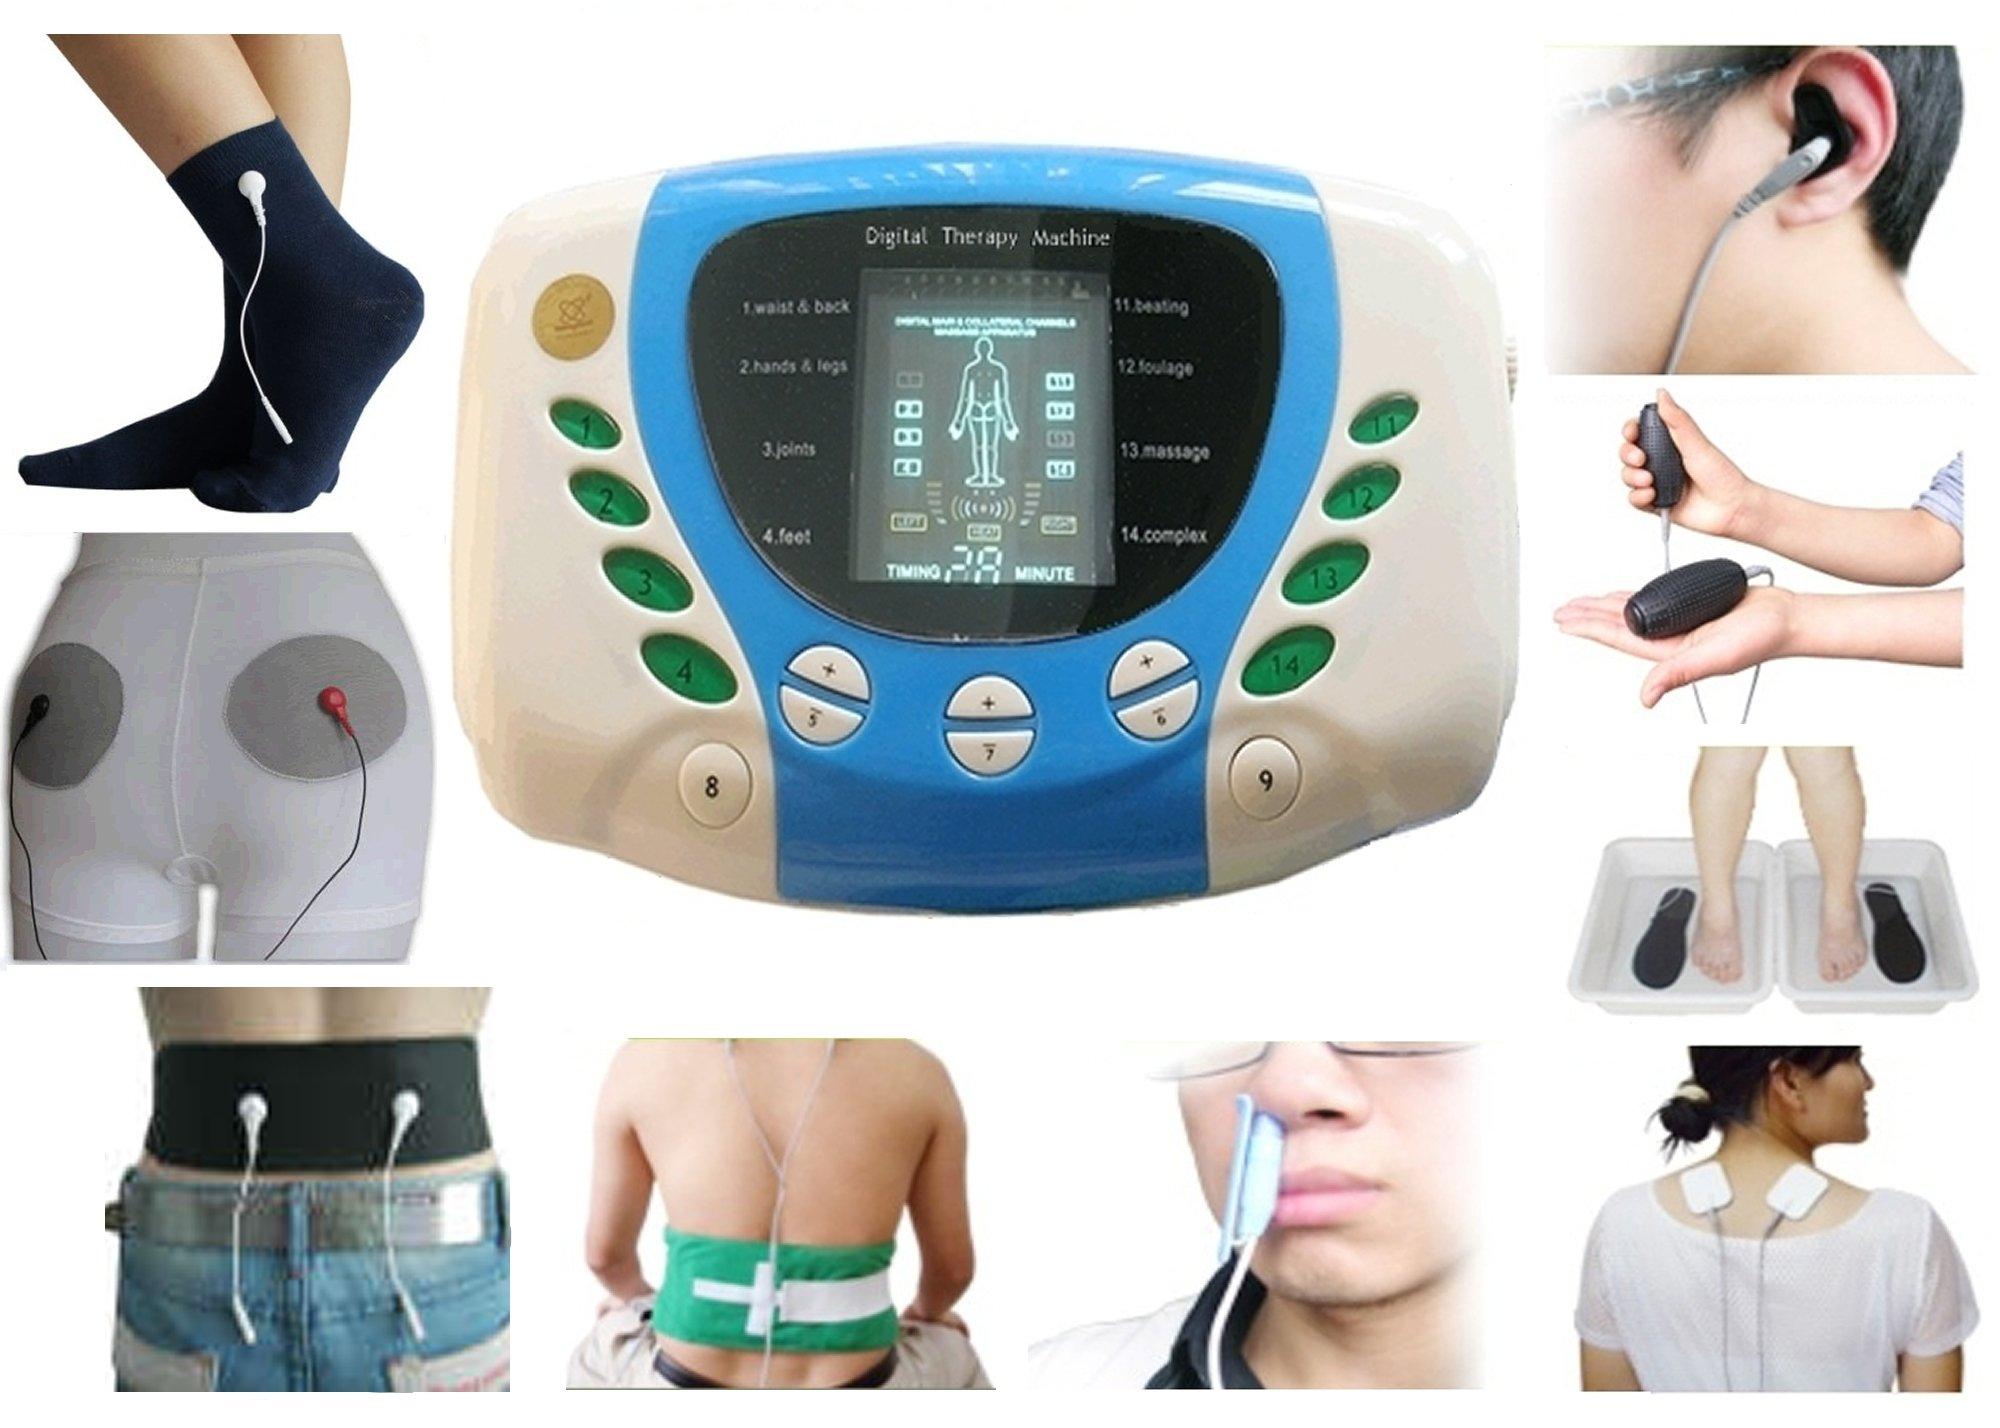 Low Back Pain Acupuncture Medicomat-5 Acupuncture